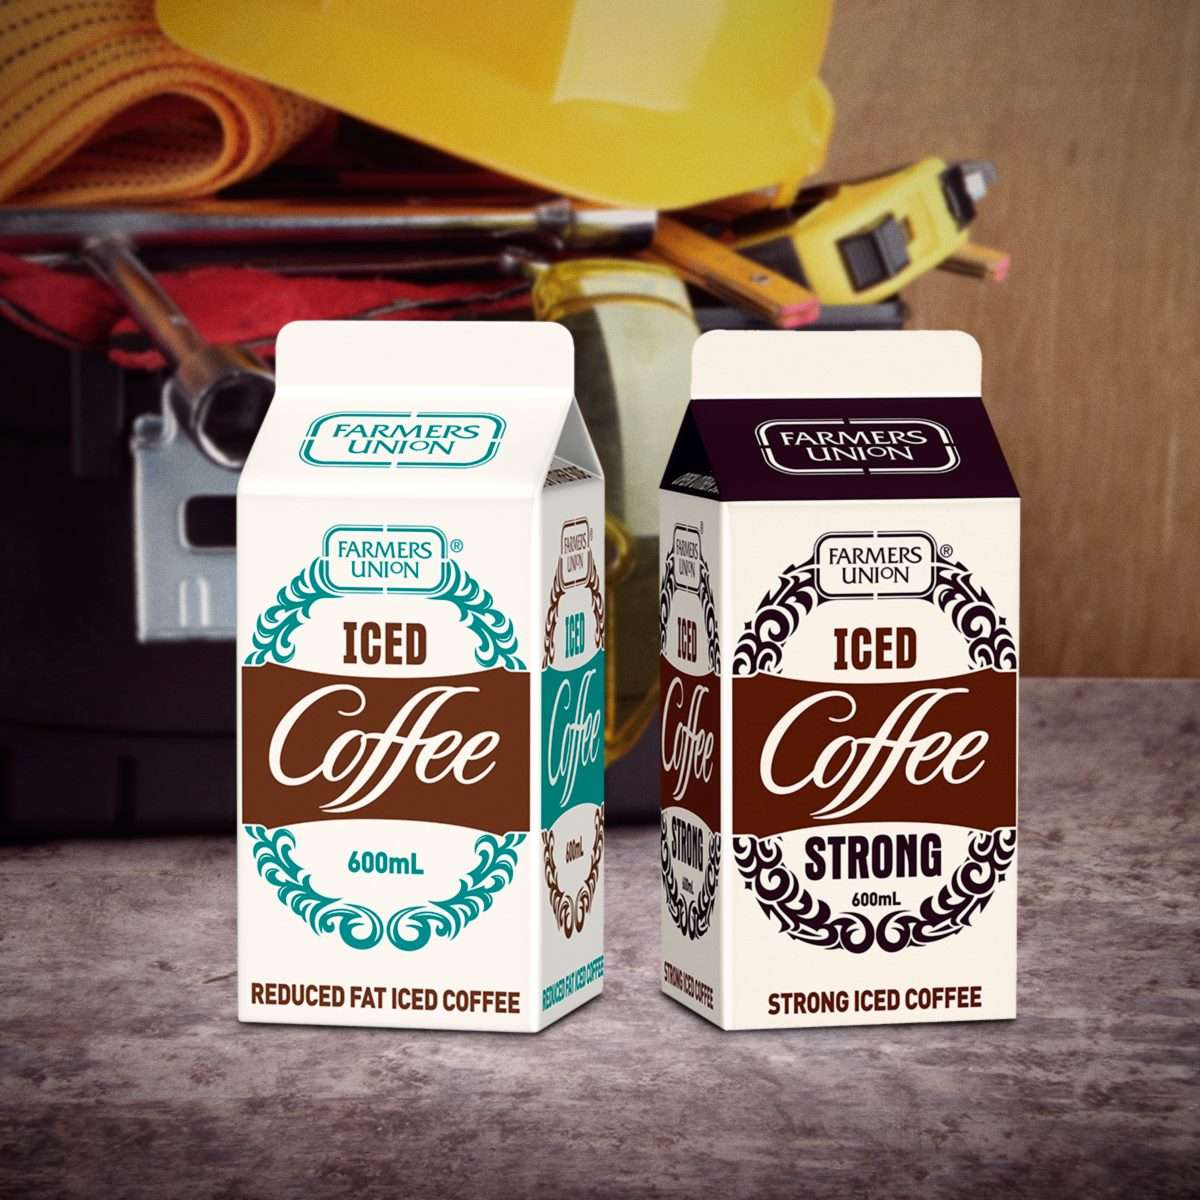 farmers union iced coffee advertisement